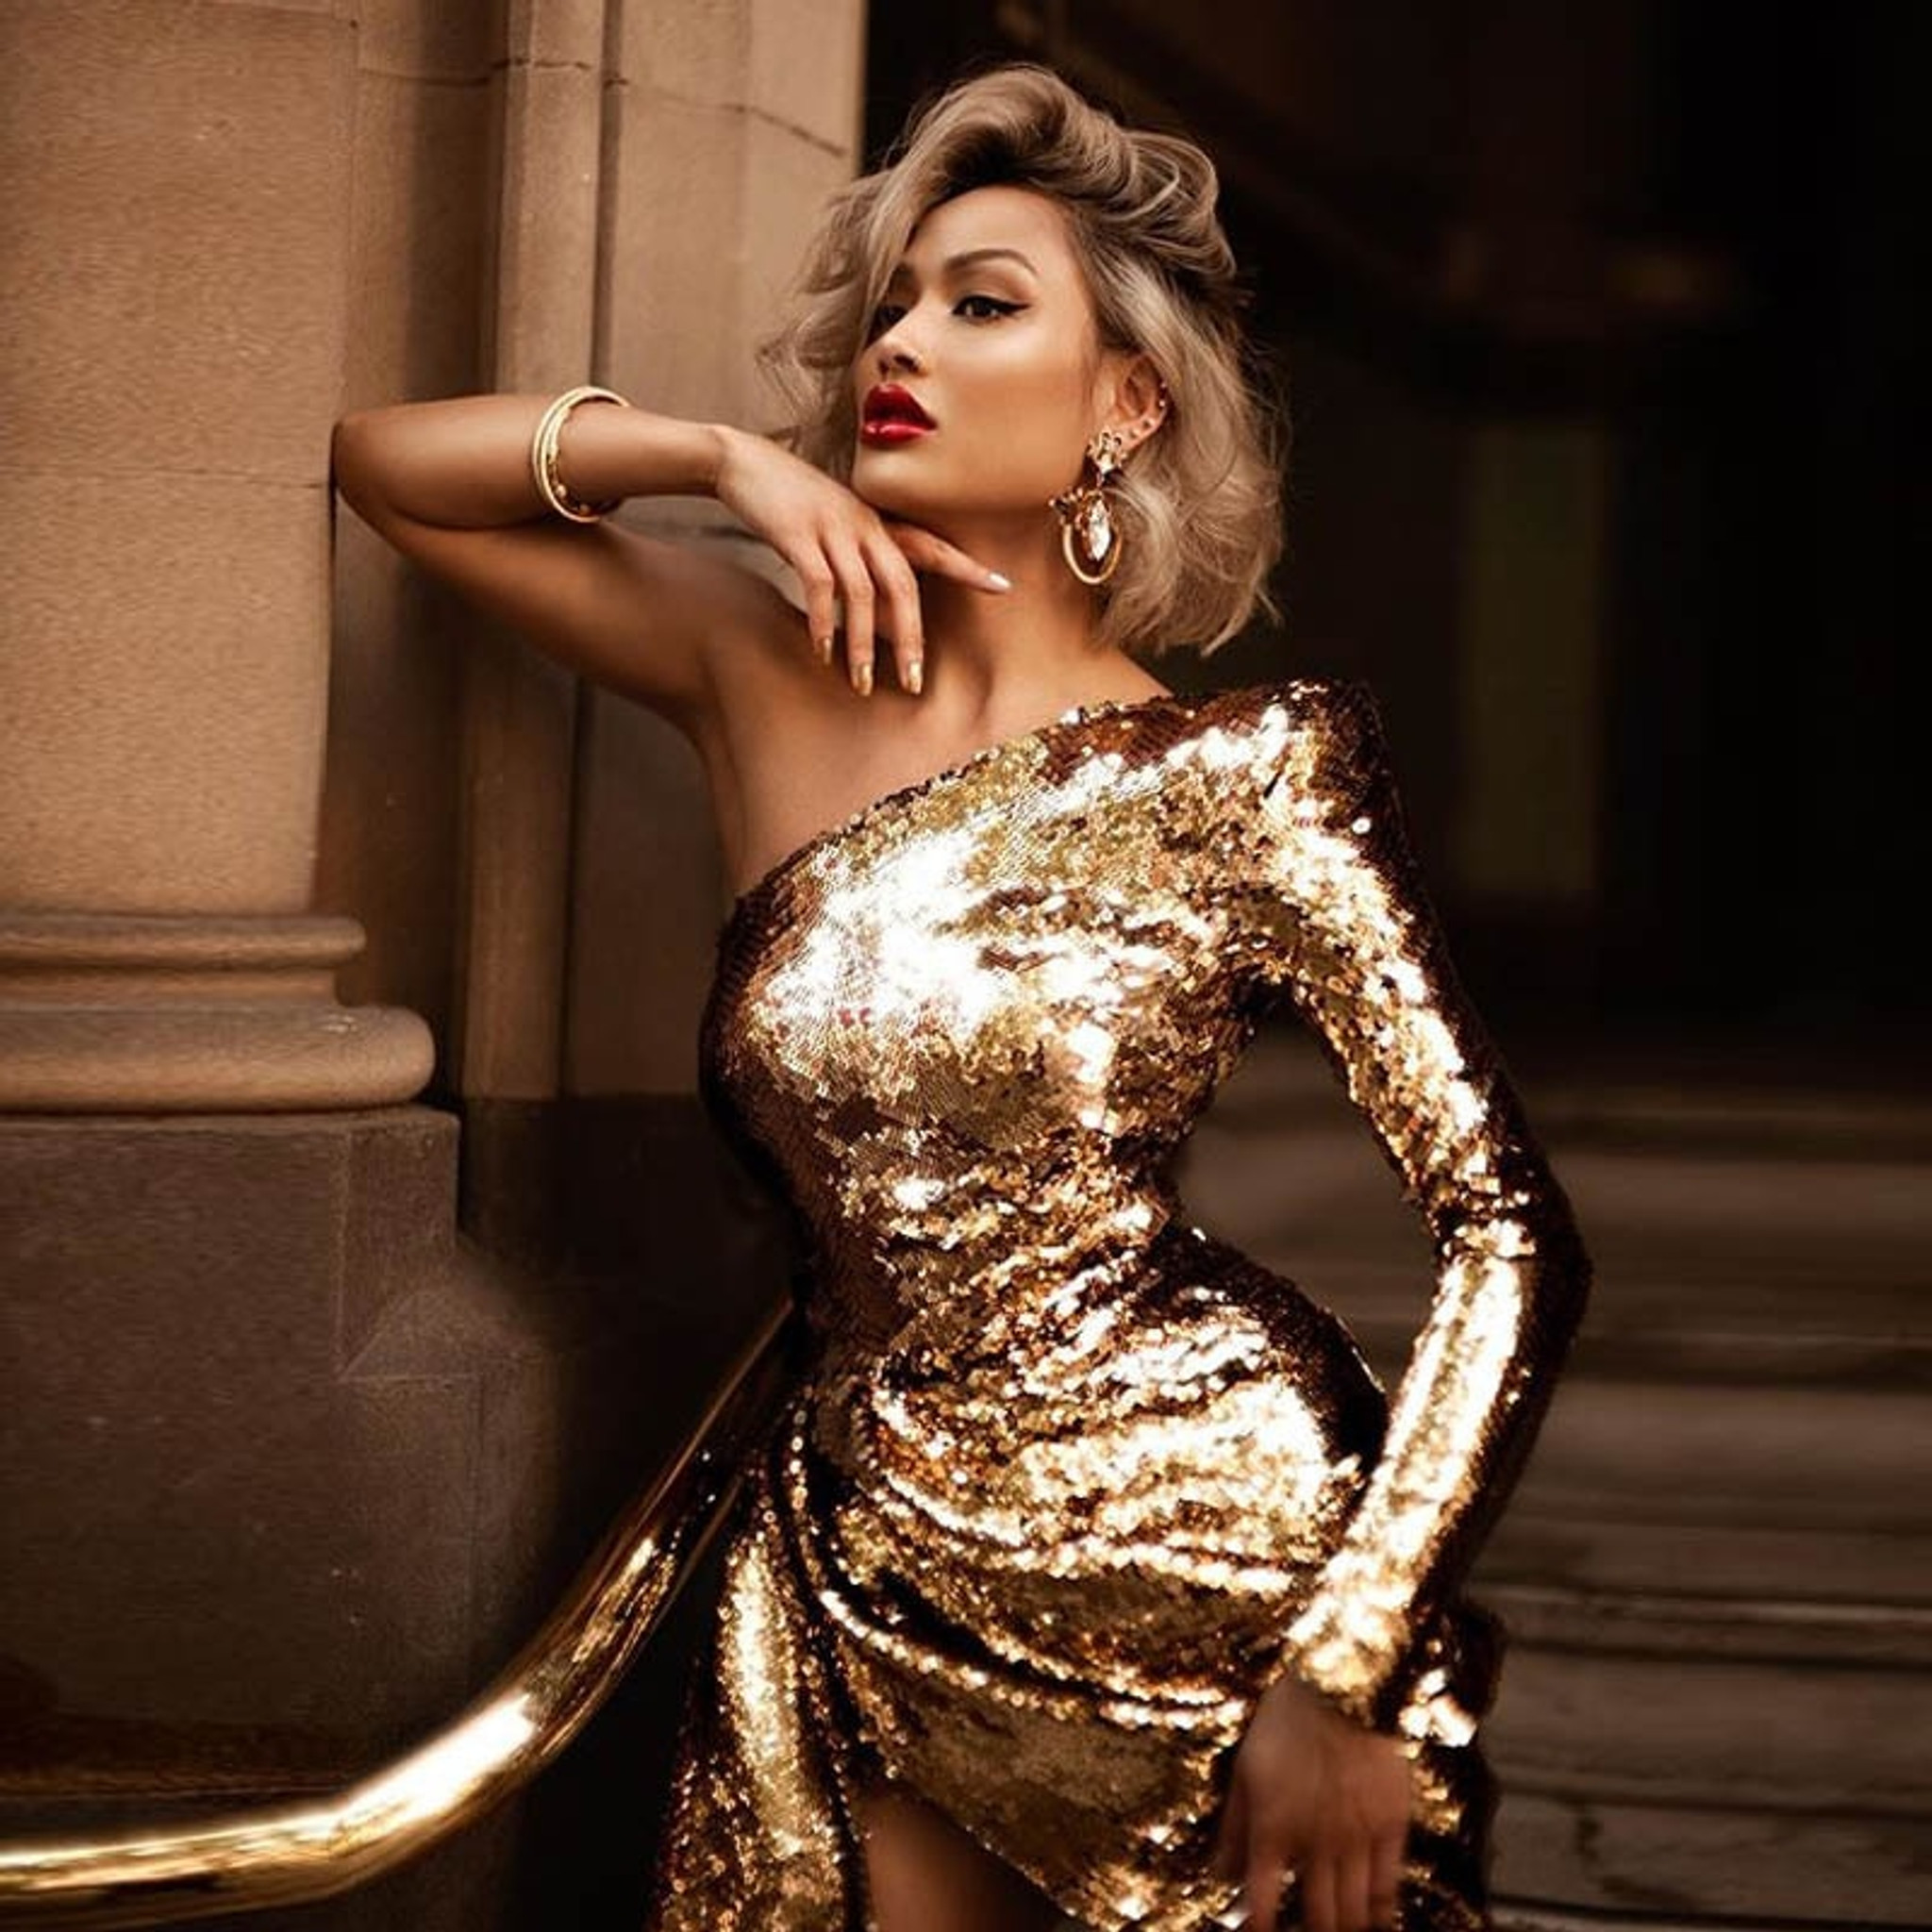 Heather Gold Dress